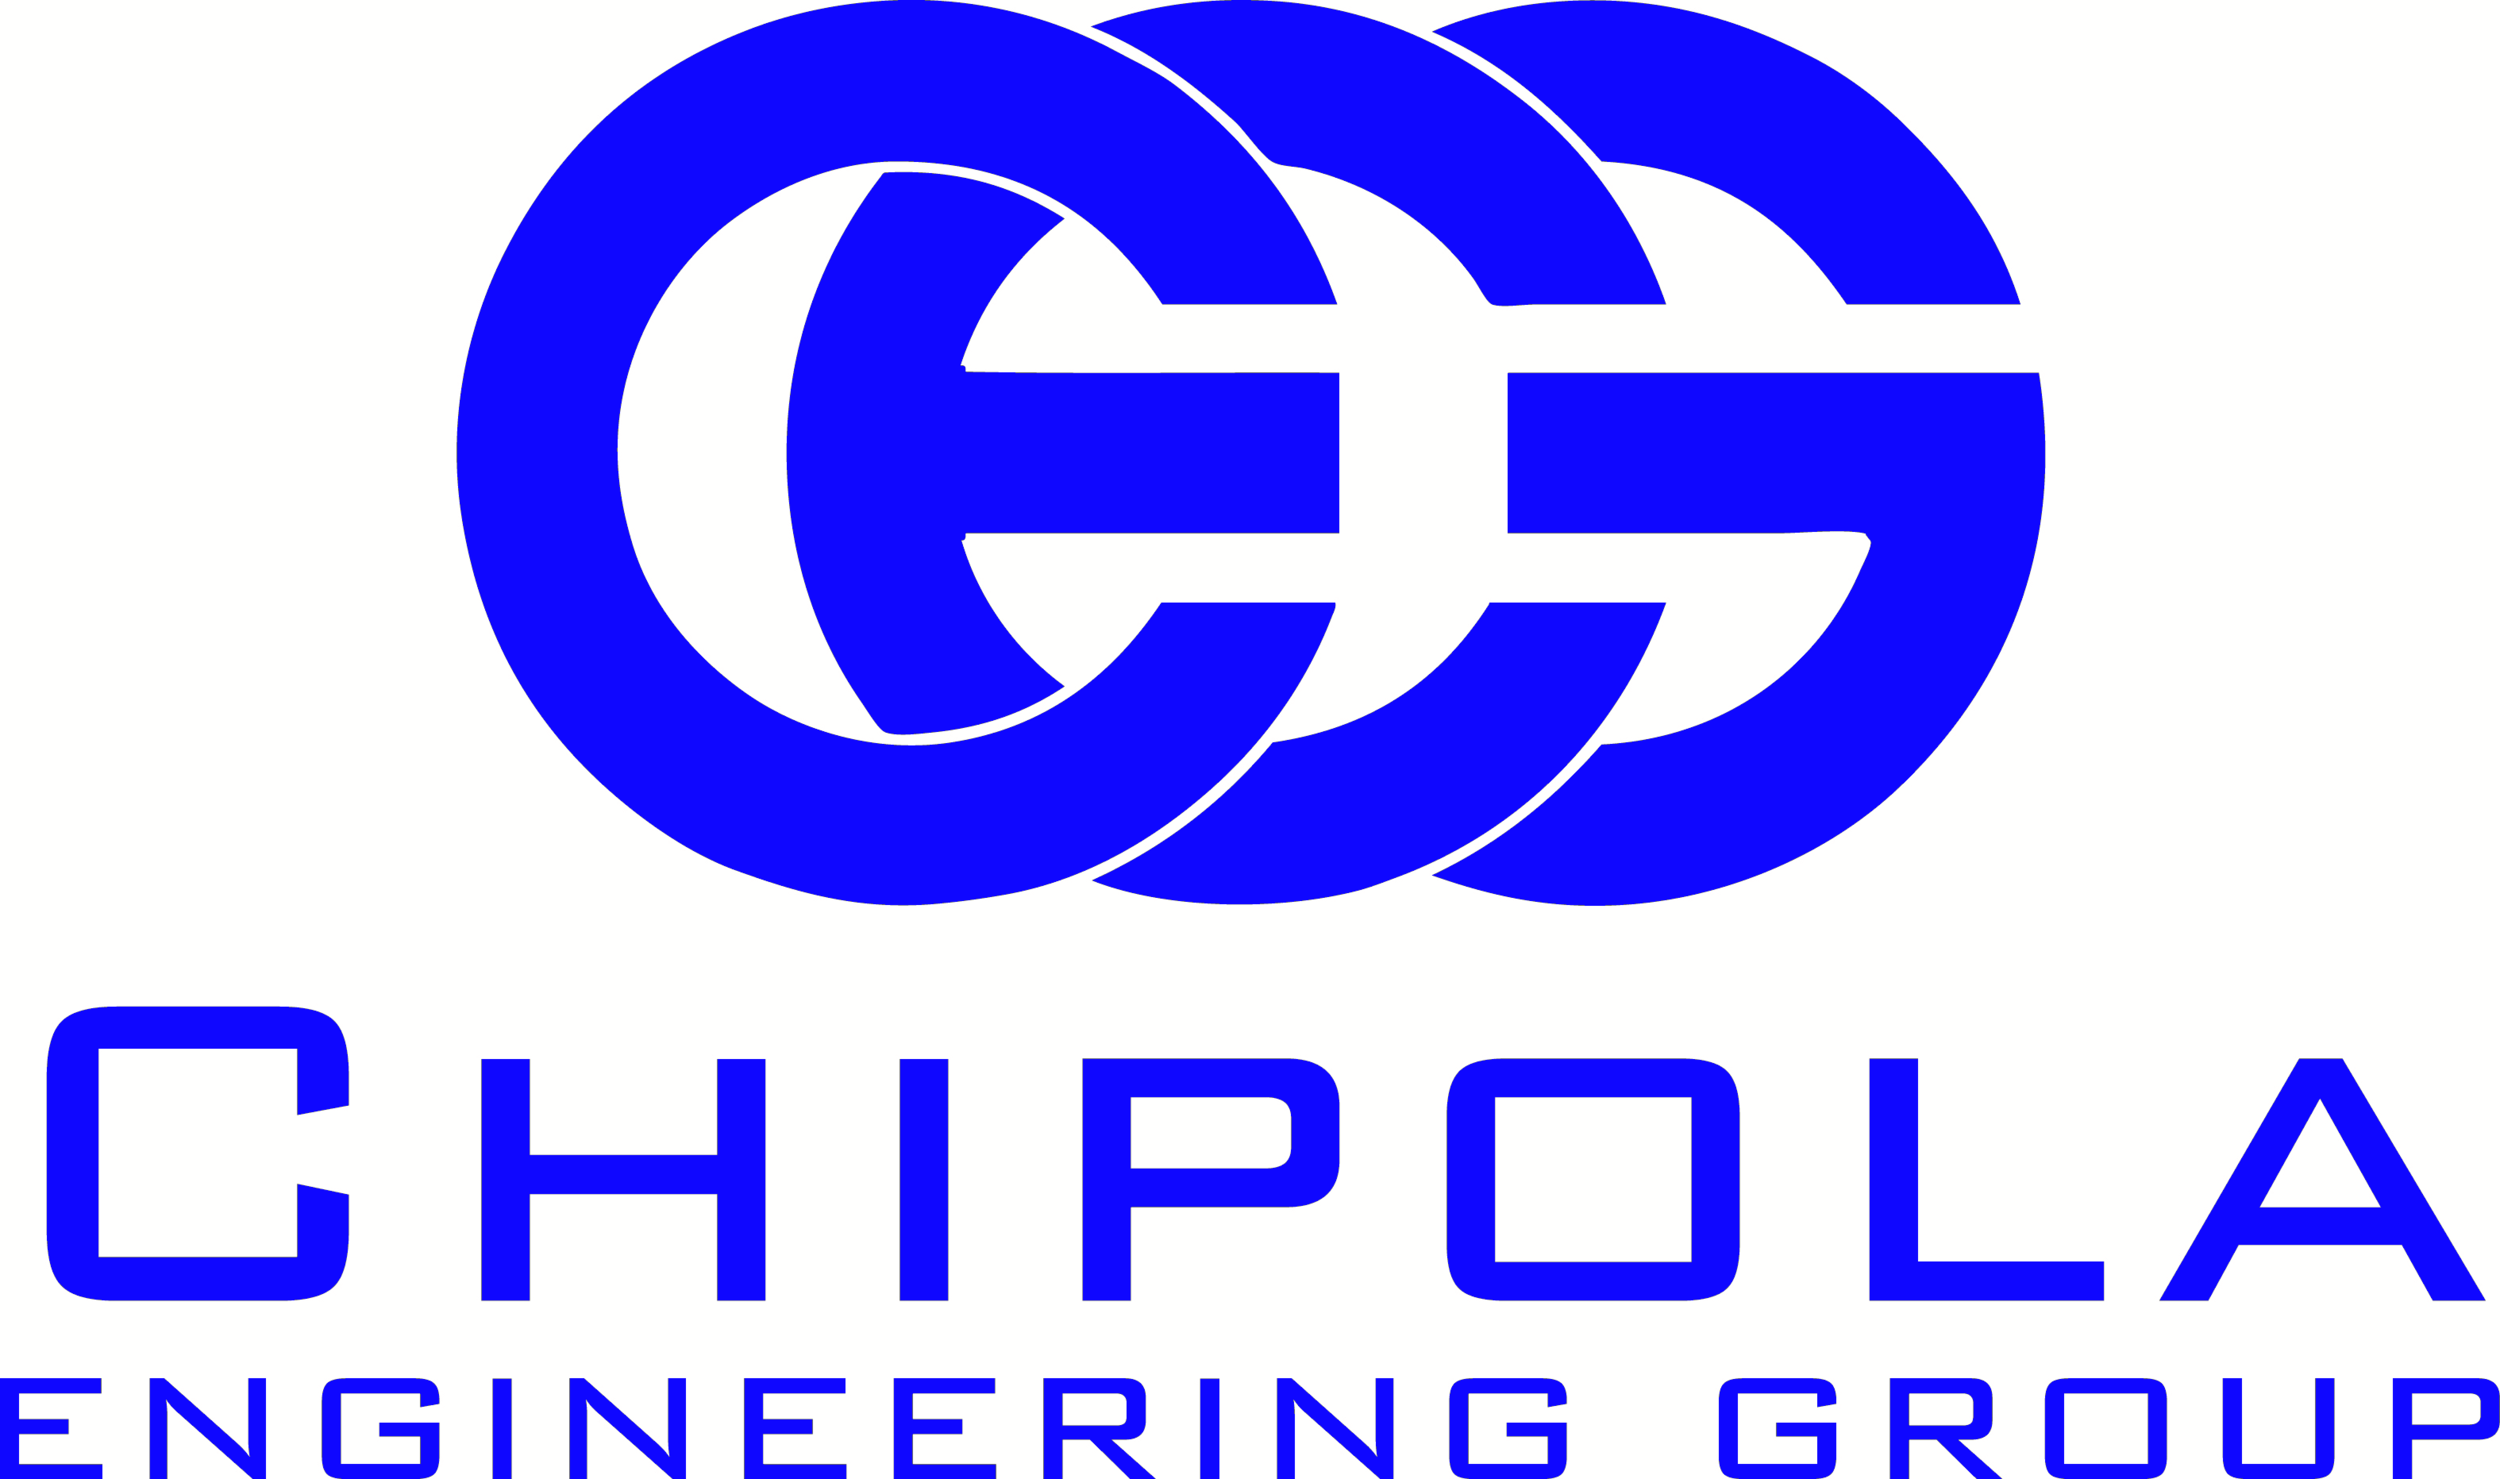 chipola engineering.png